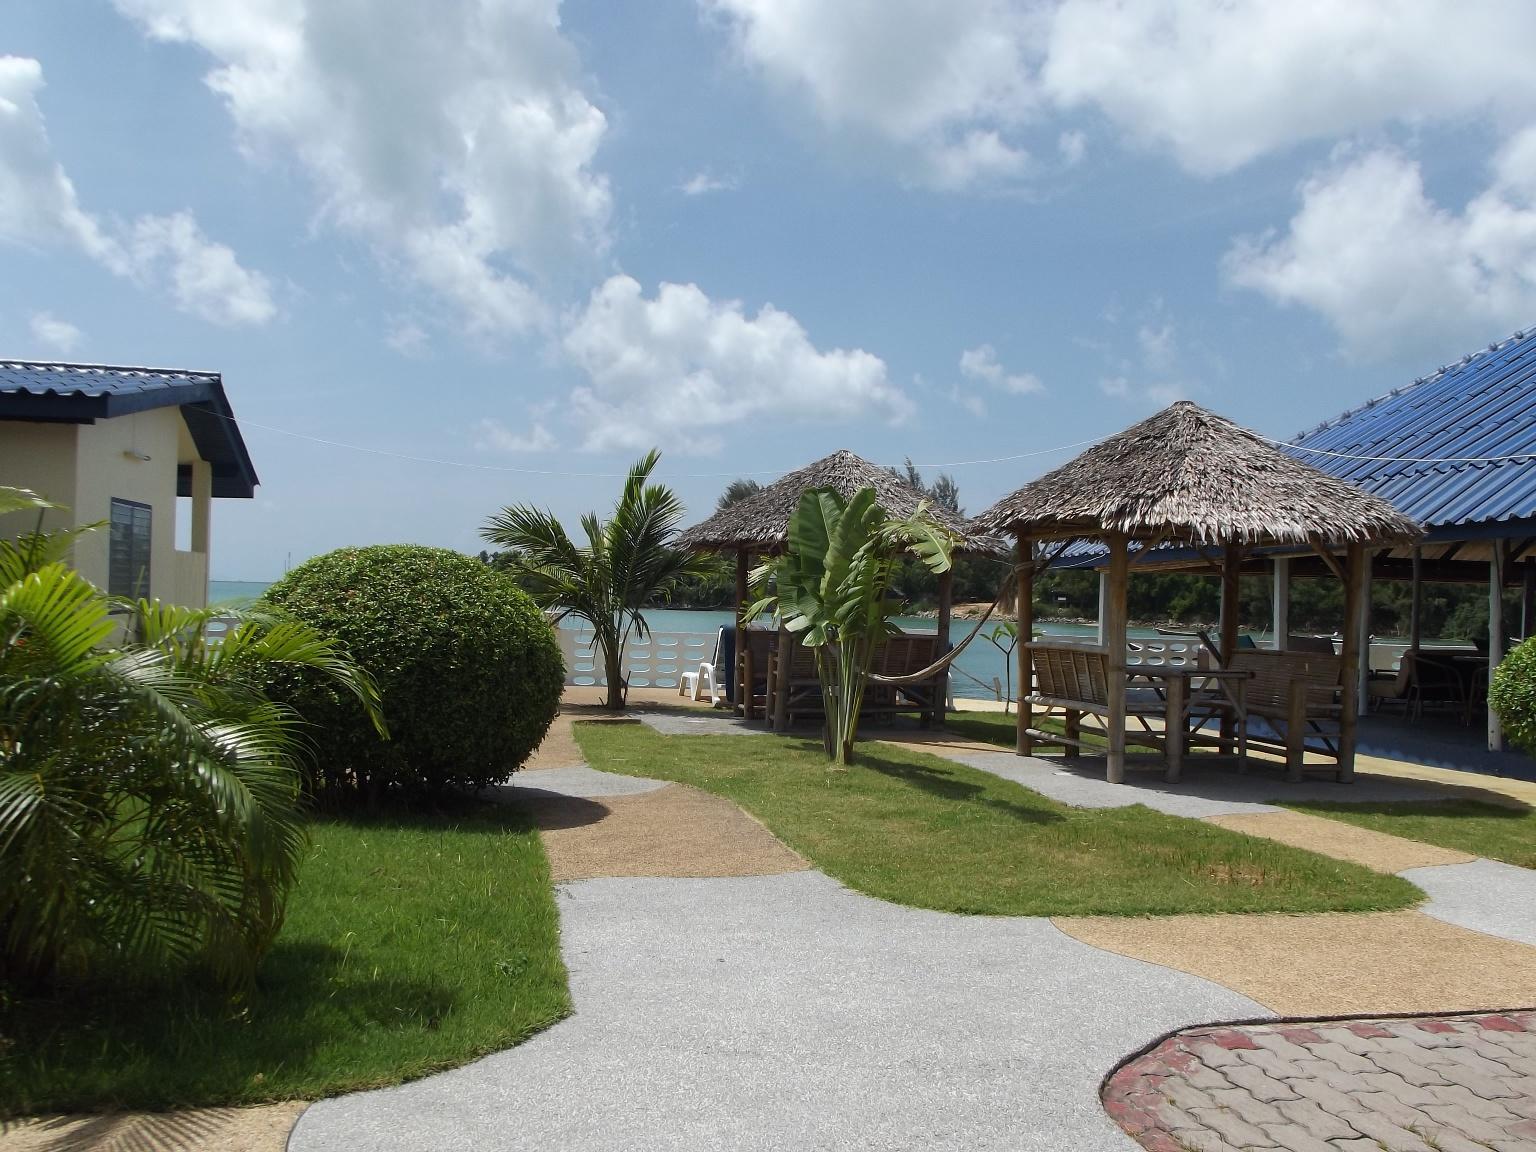 Fiji Palms Hotel Phuket